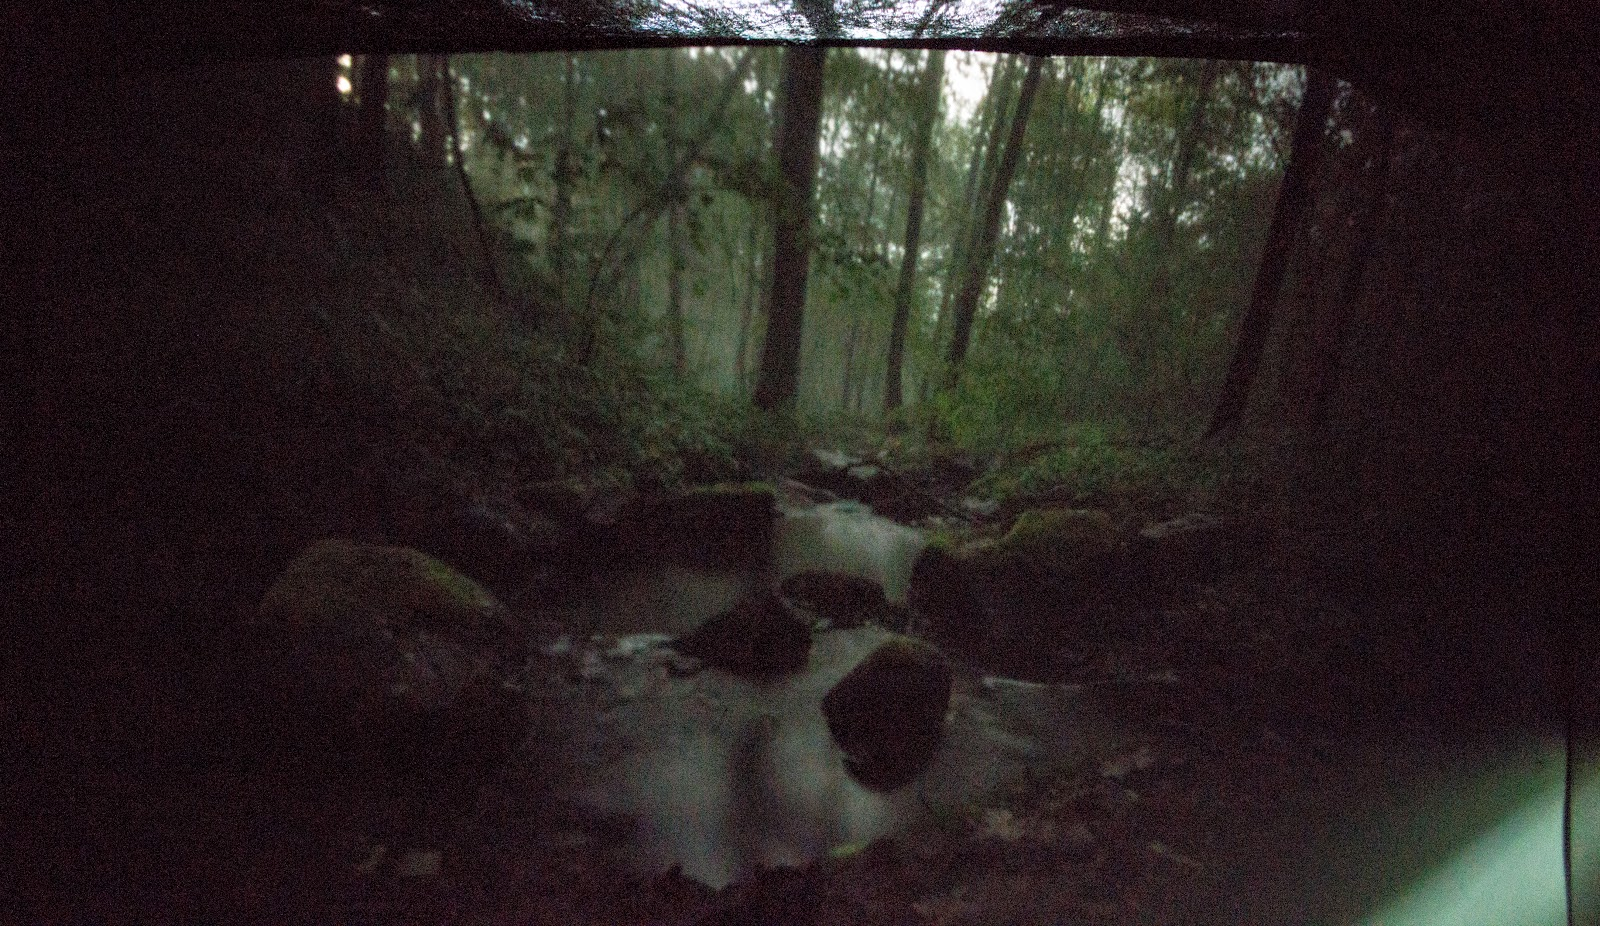 Pinhole, струмок, річка, яр, вода, ліс